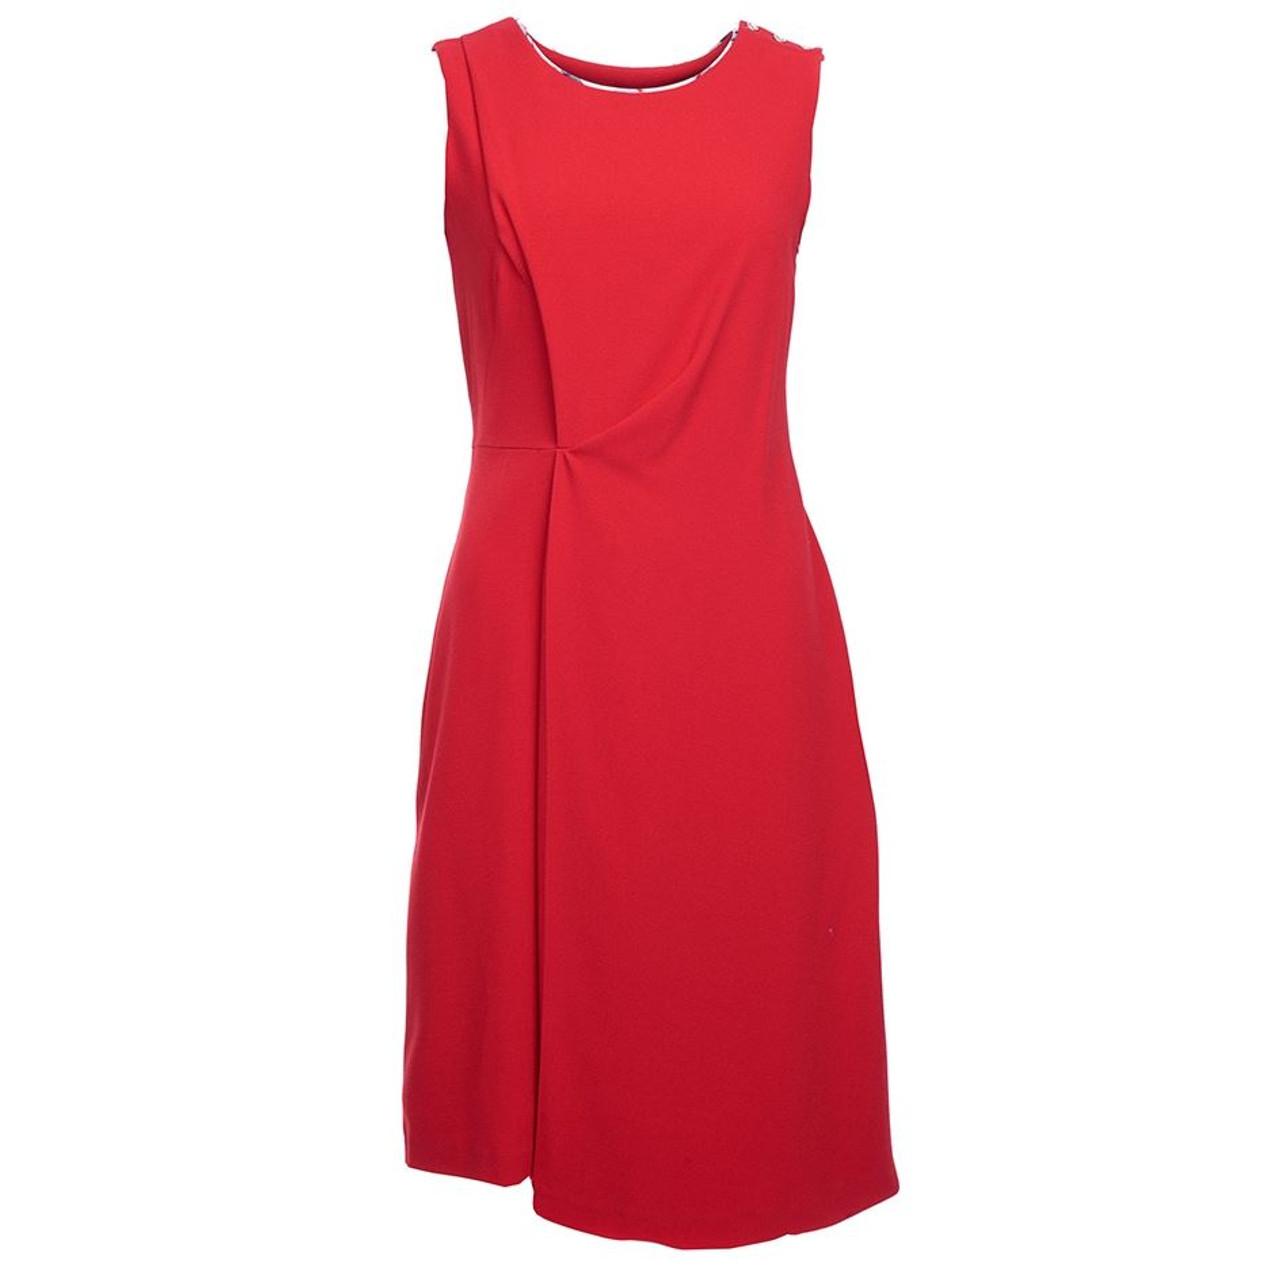 Barbour Leathen Sleeveless Dress